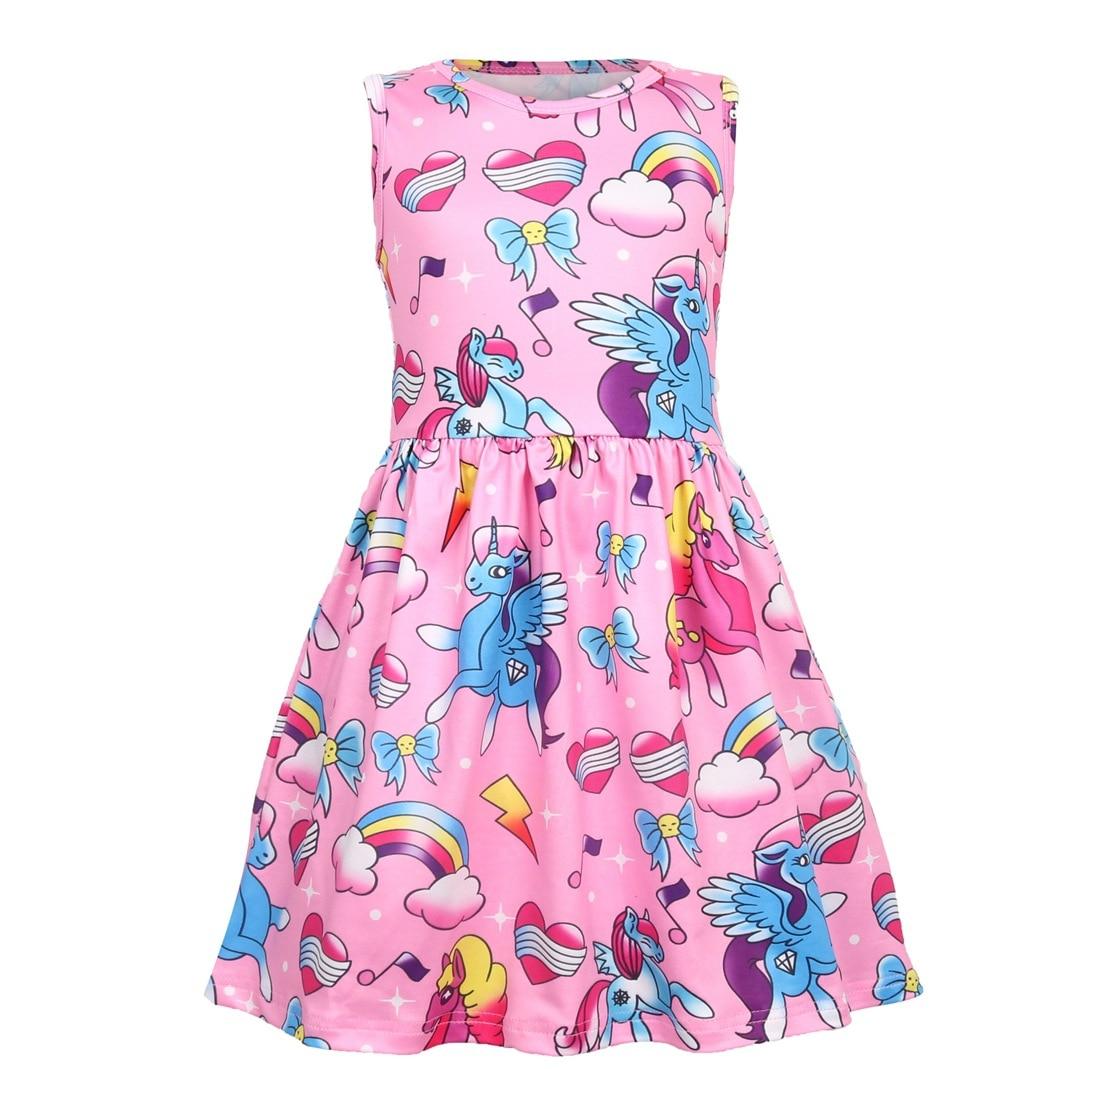 Children Clothing Vestidos My little Baby Flamingo Unicorn Party Girl Dress Kids Summer Dresses for Girls Clothes Princess Dress 2